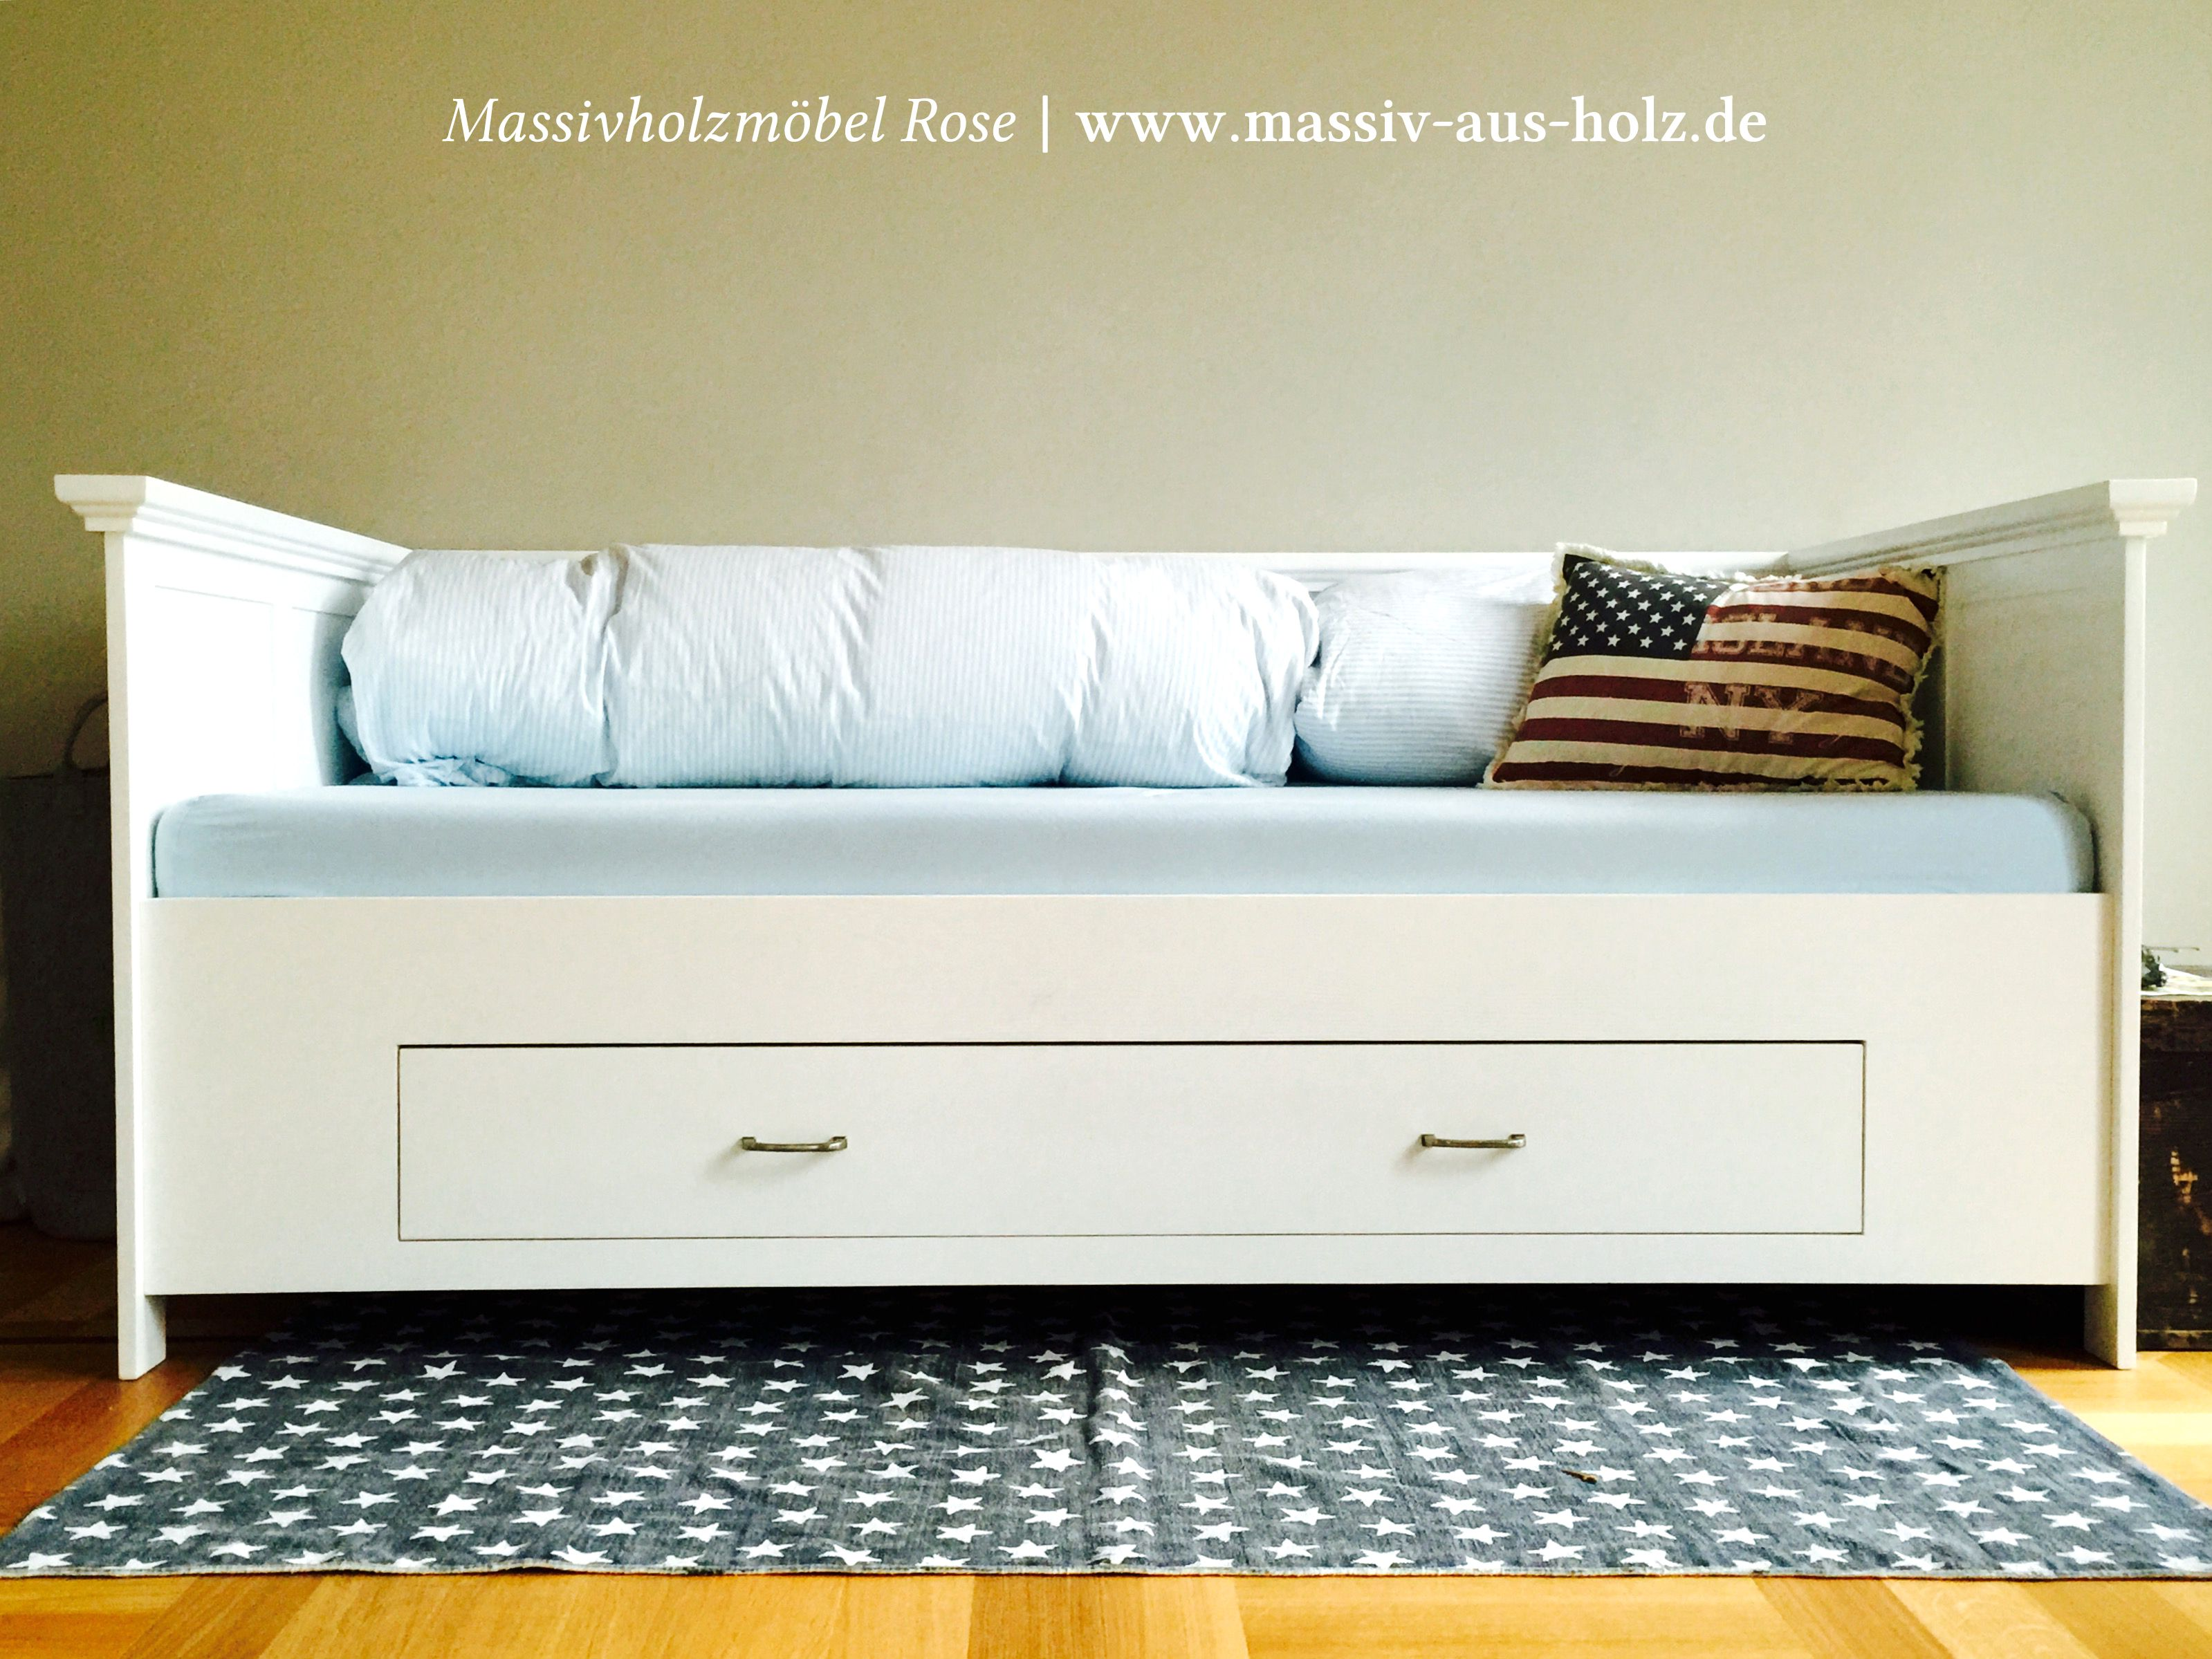 www.massiv-aus-holz.de #Romantic #Lifestyle: #Weißes #Landhaus-#Bett ...